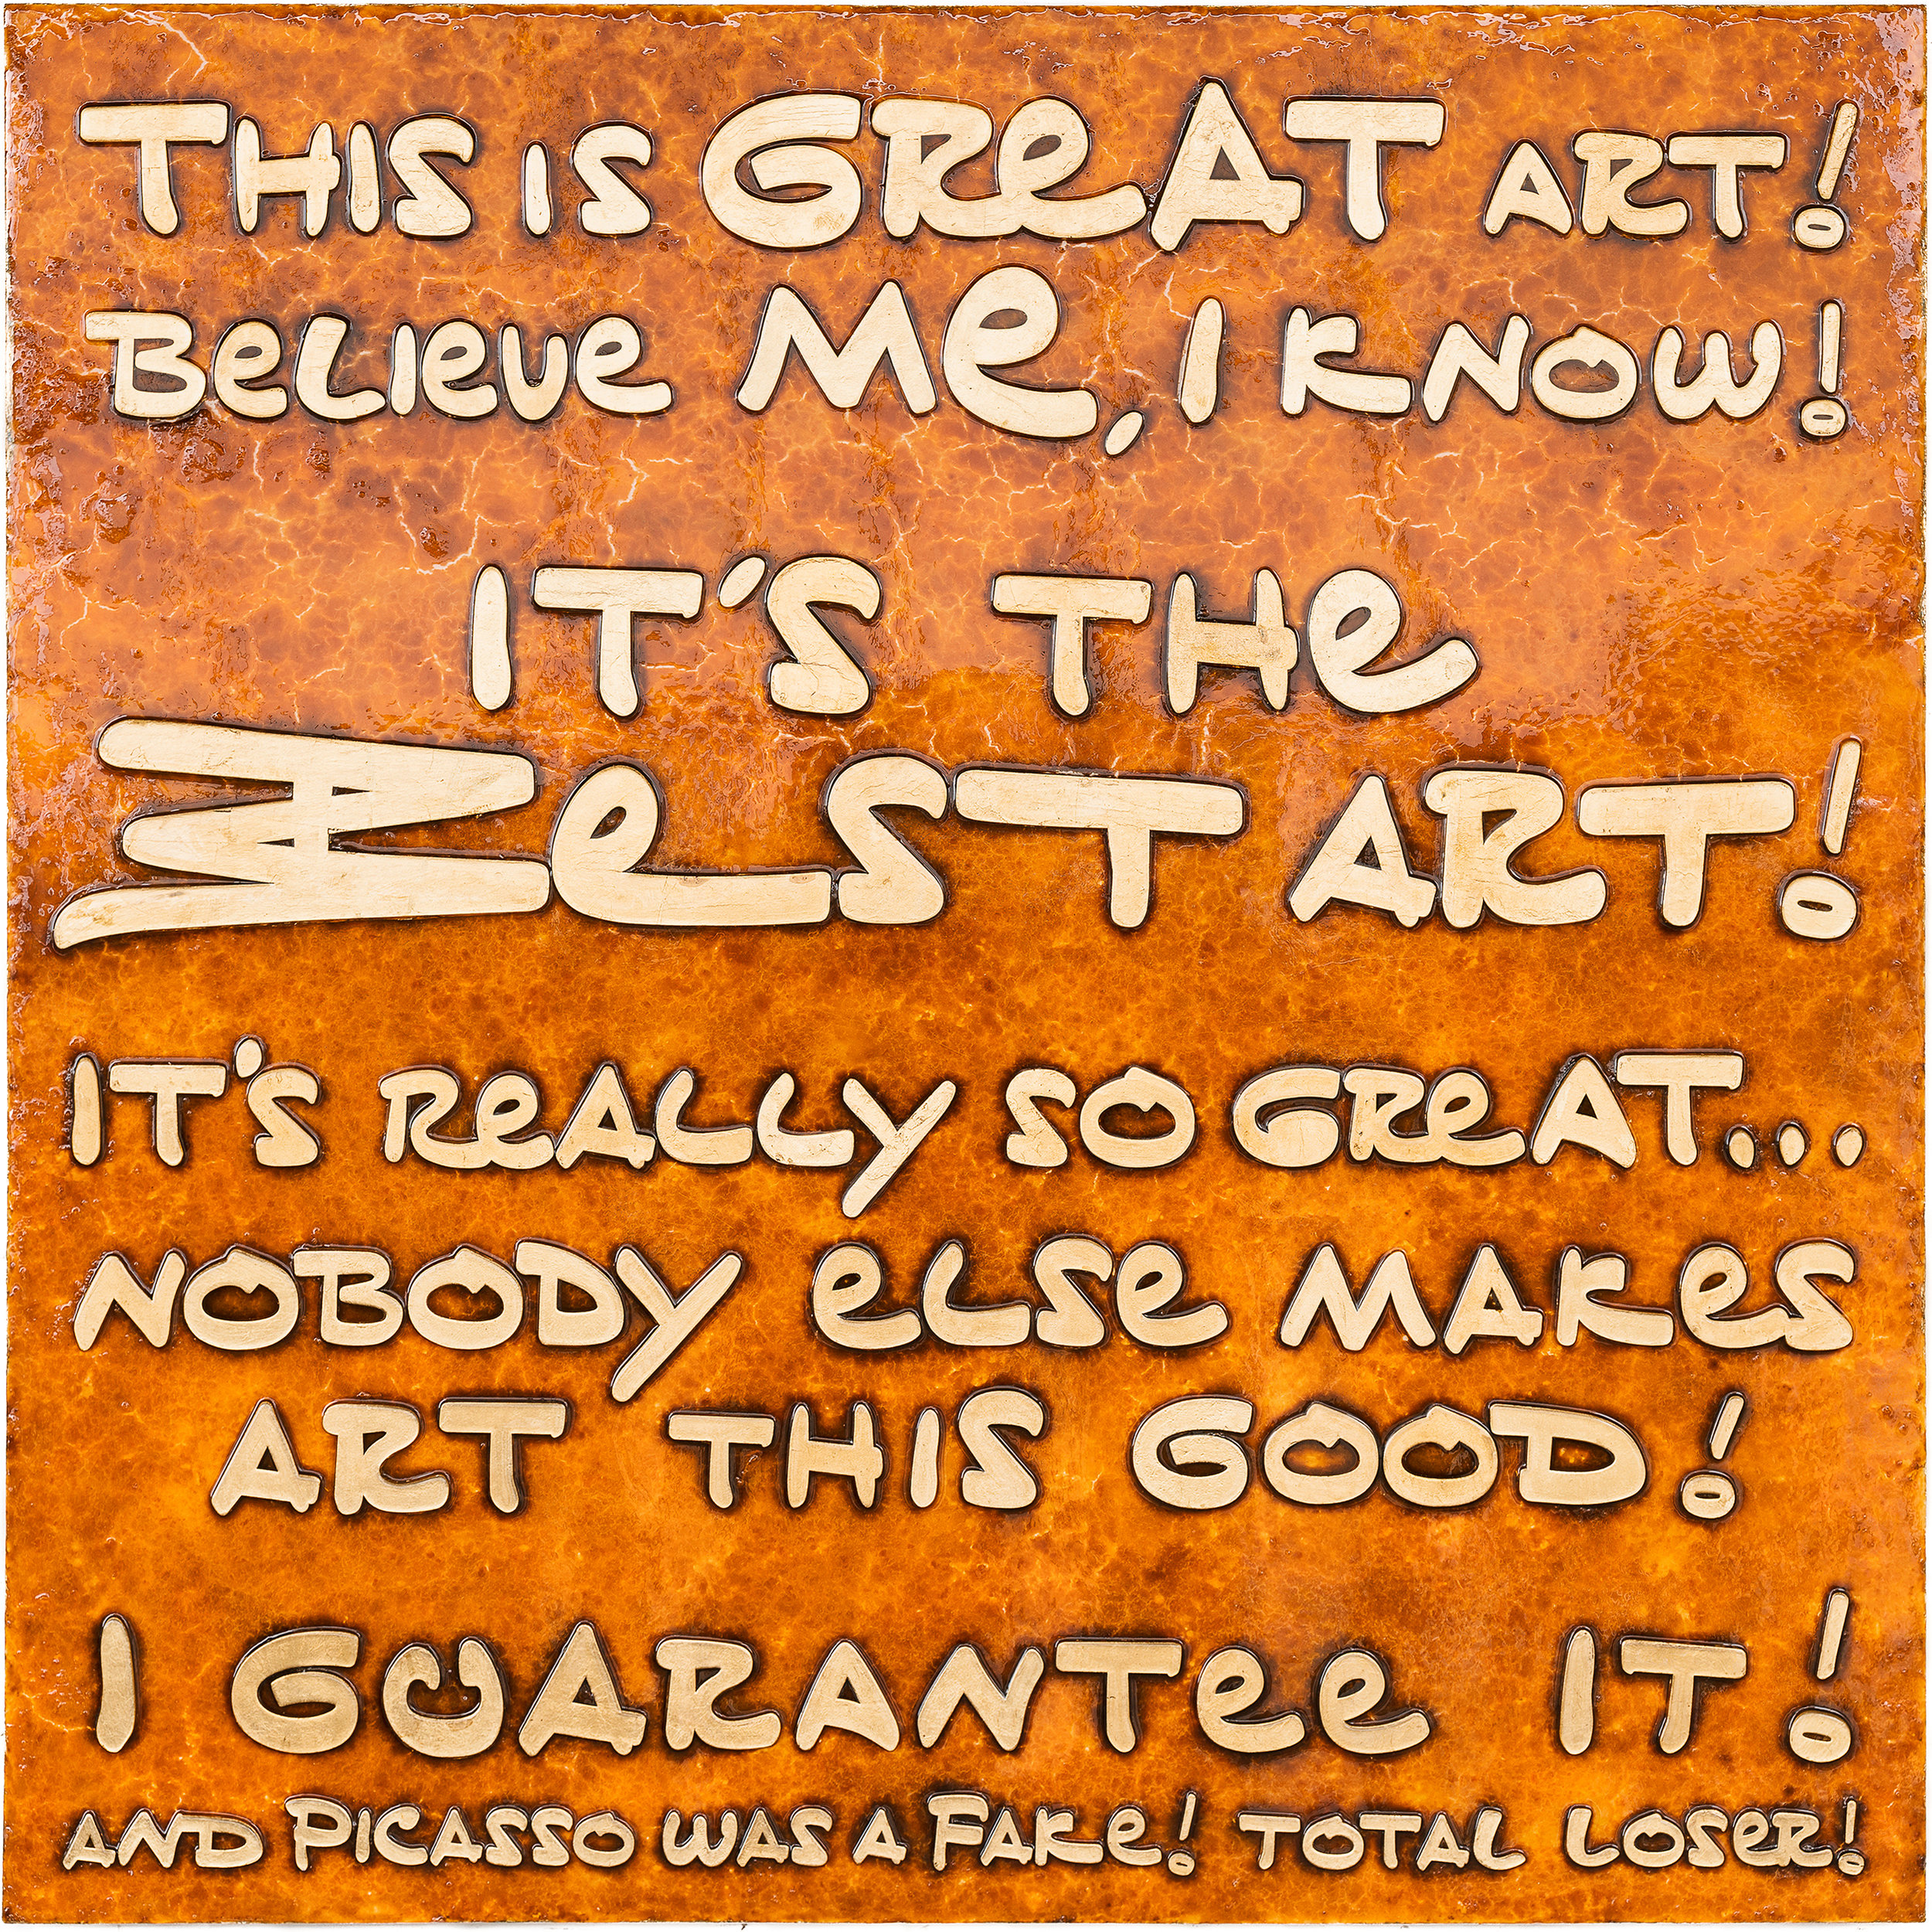 The Best Art Ever!